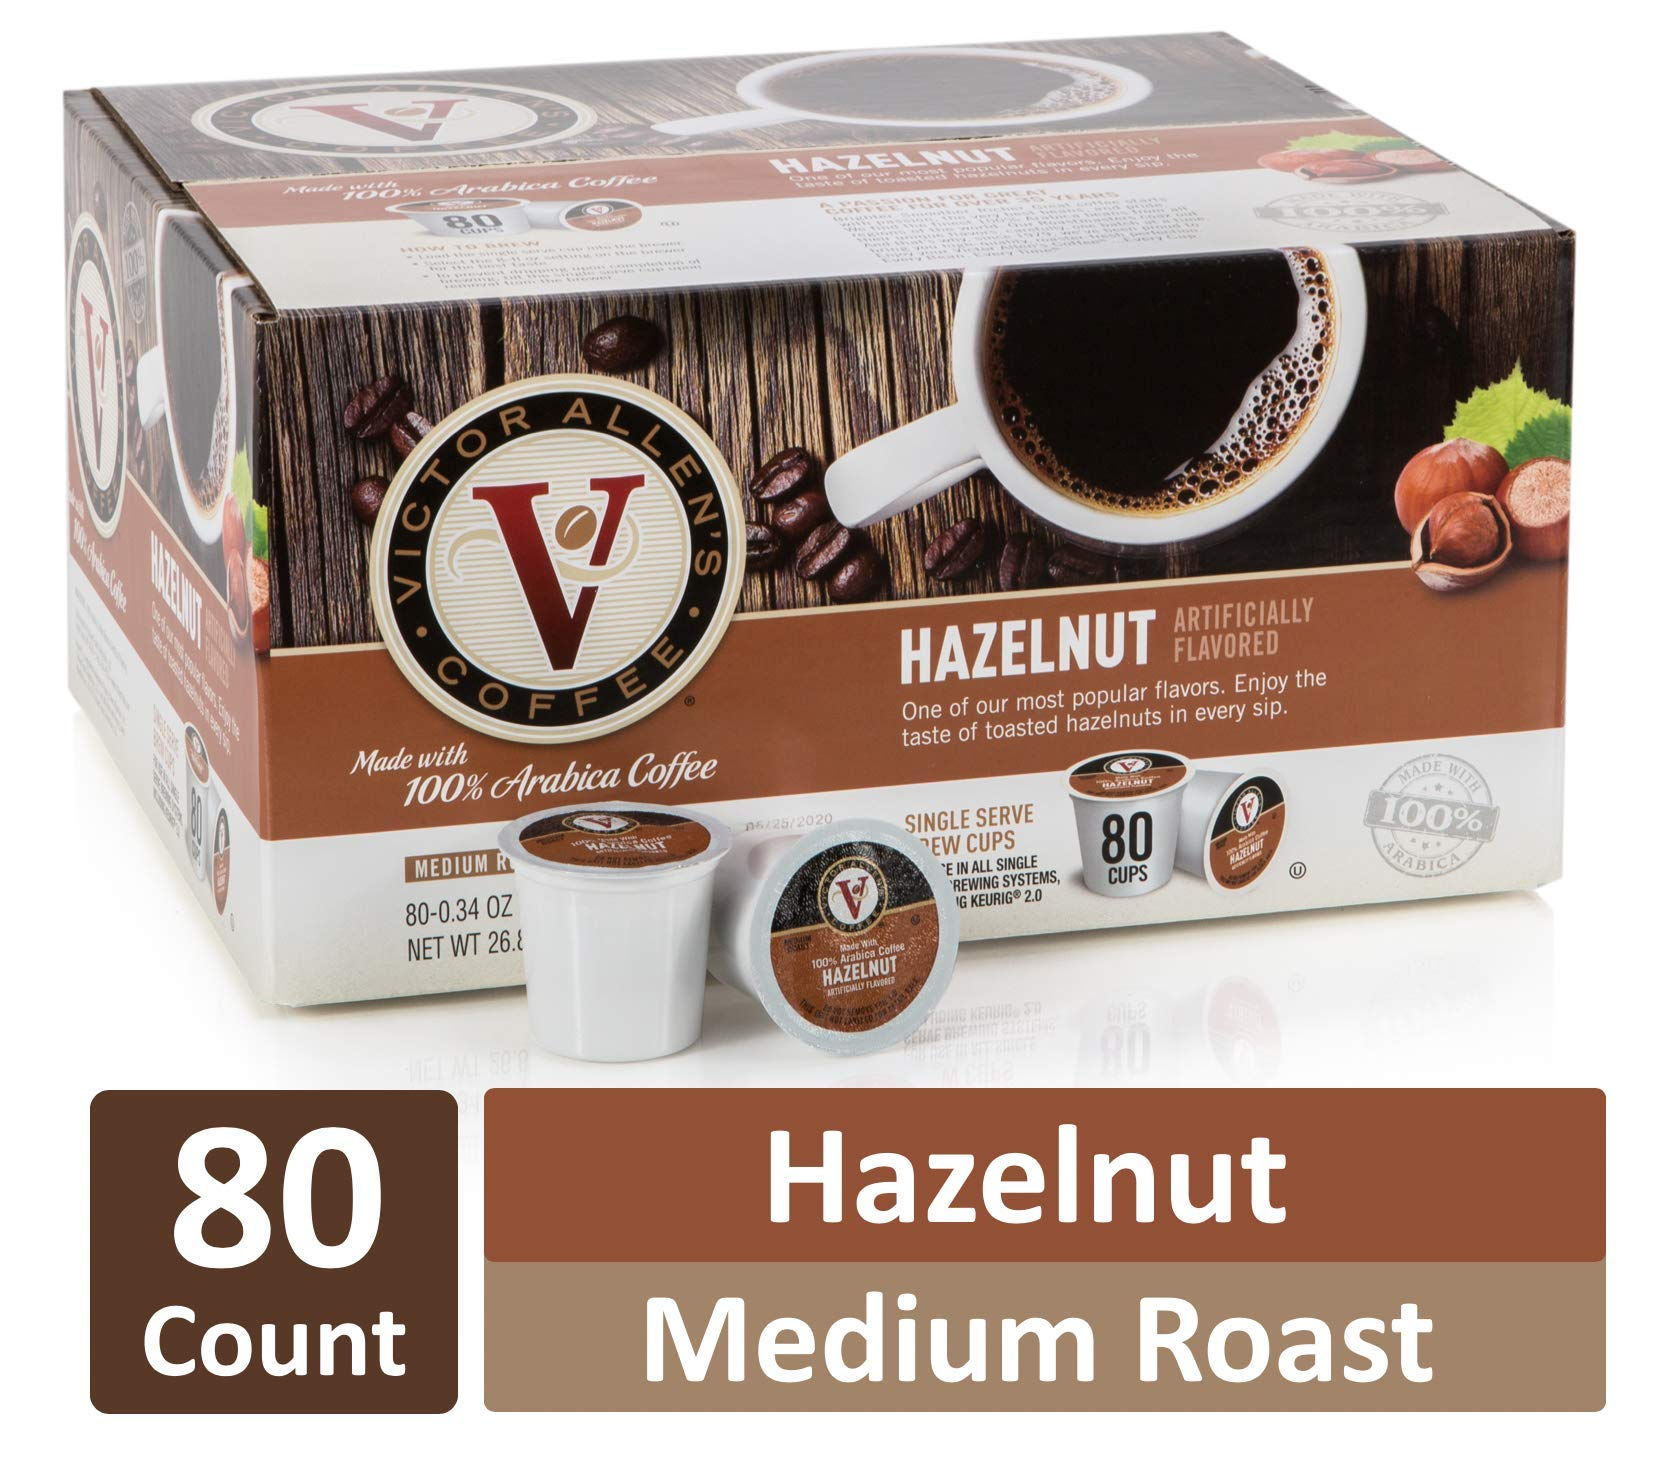 Hazelnut for K-Cup Keurig 2.0 Brewers, 80 Count, Victor Allen's Coffee Medium Roast Single Serve Coffee Pods